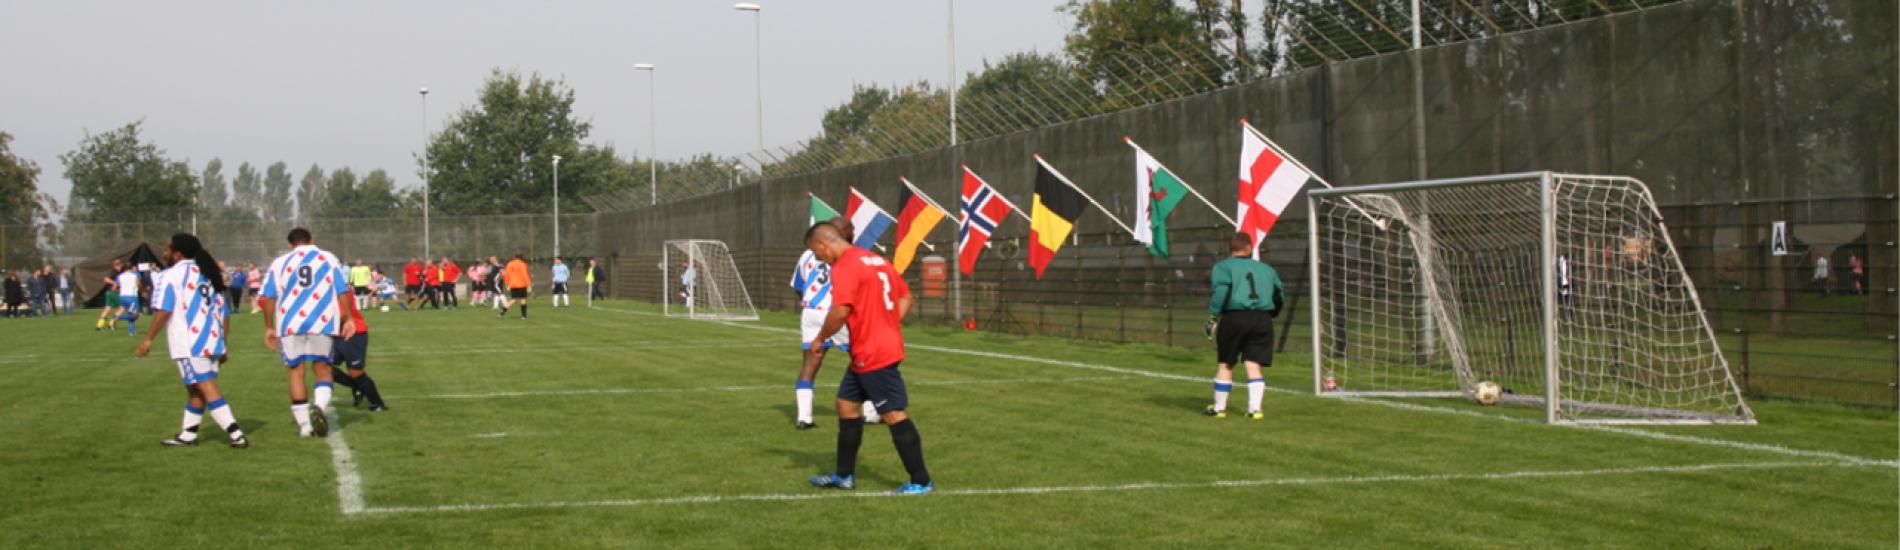 Football Works Festival Programme Header